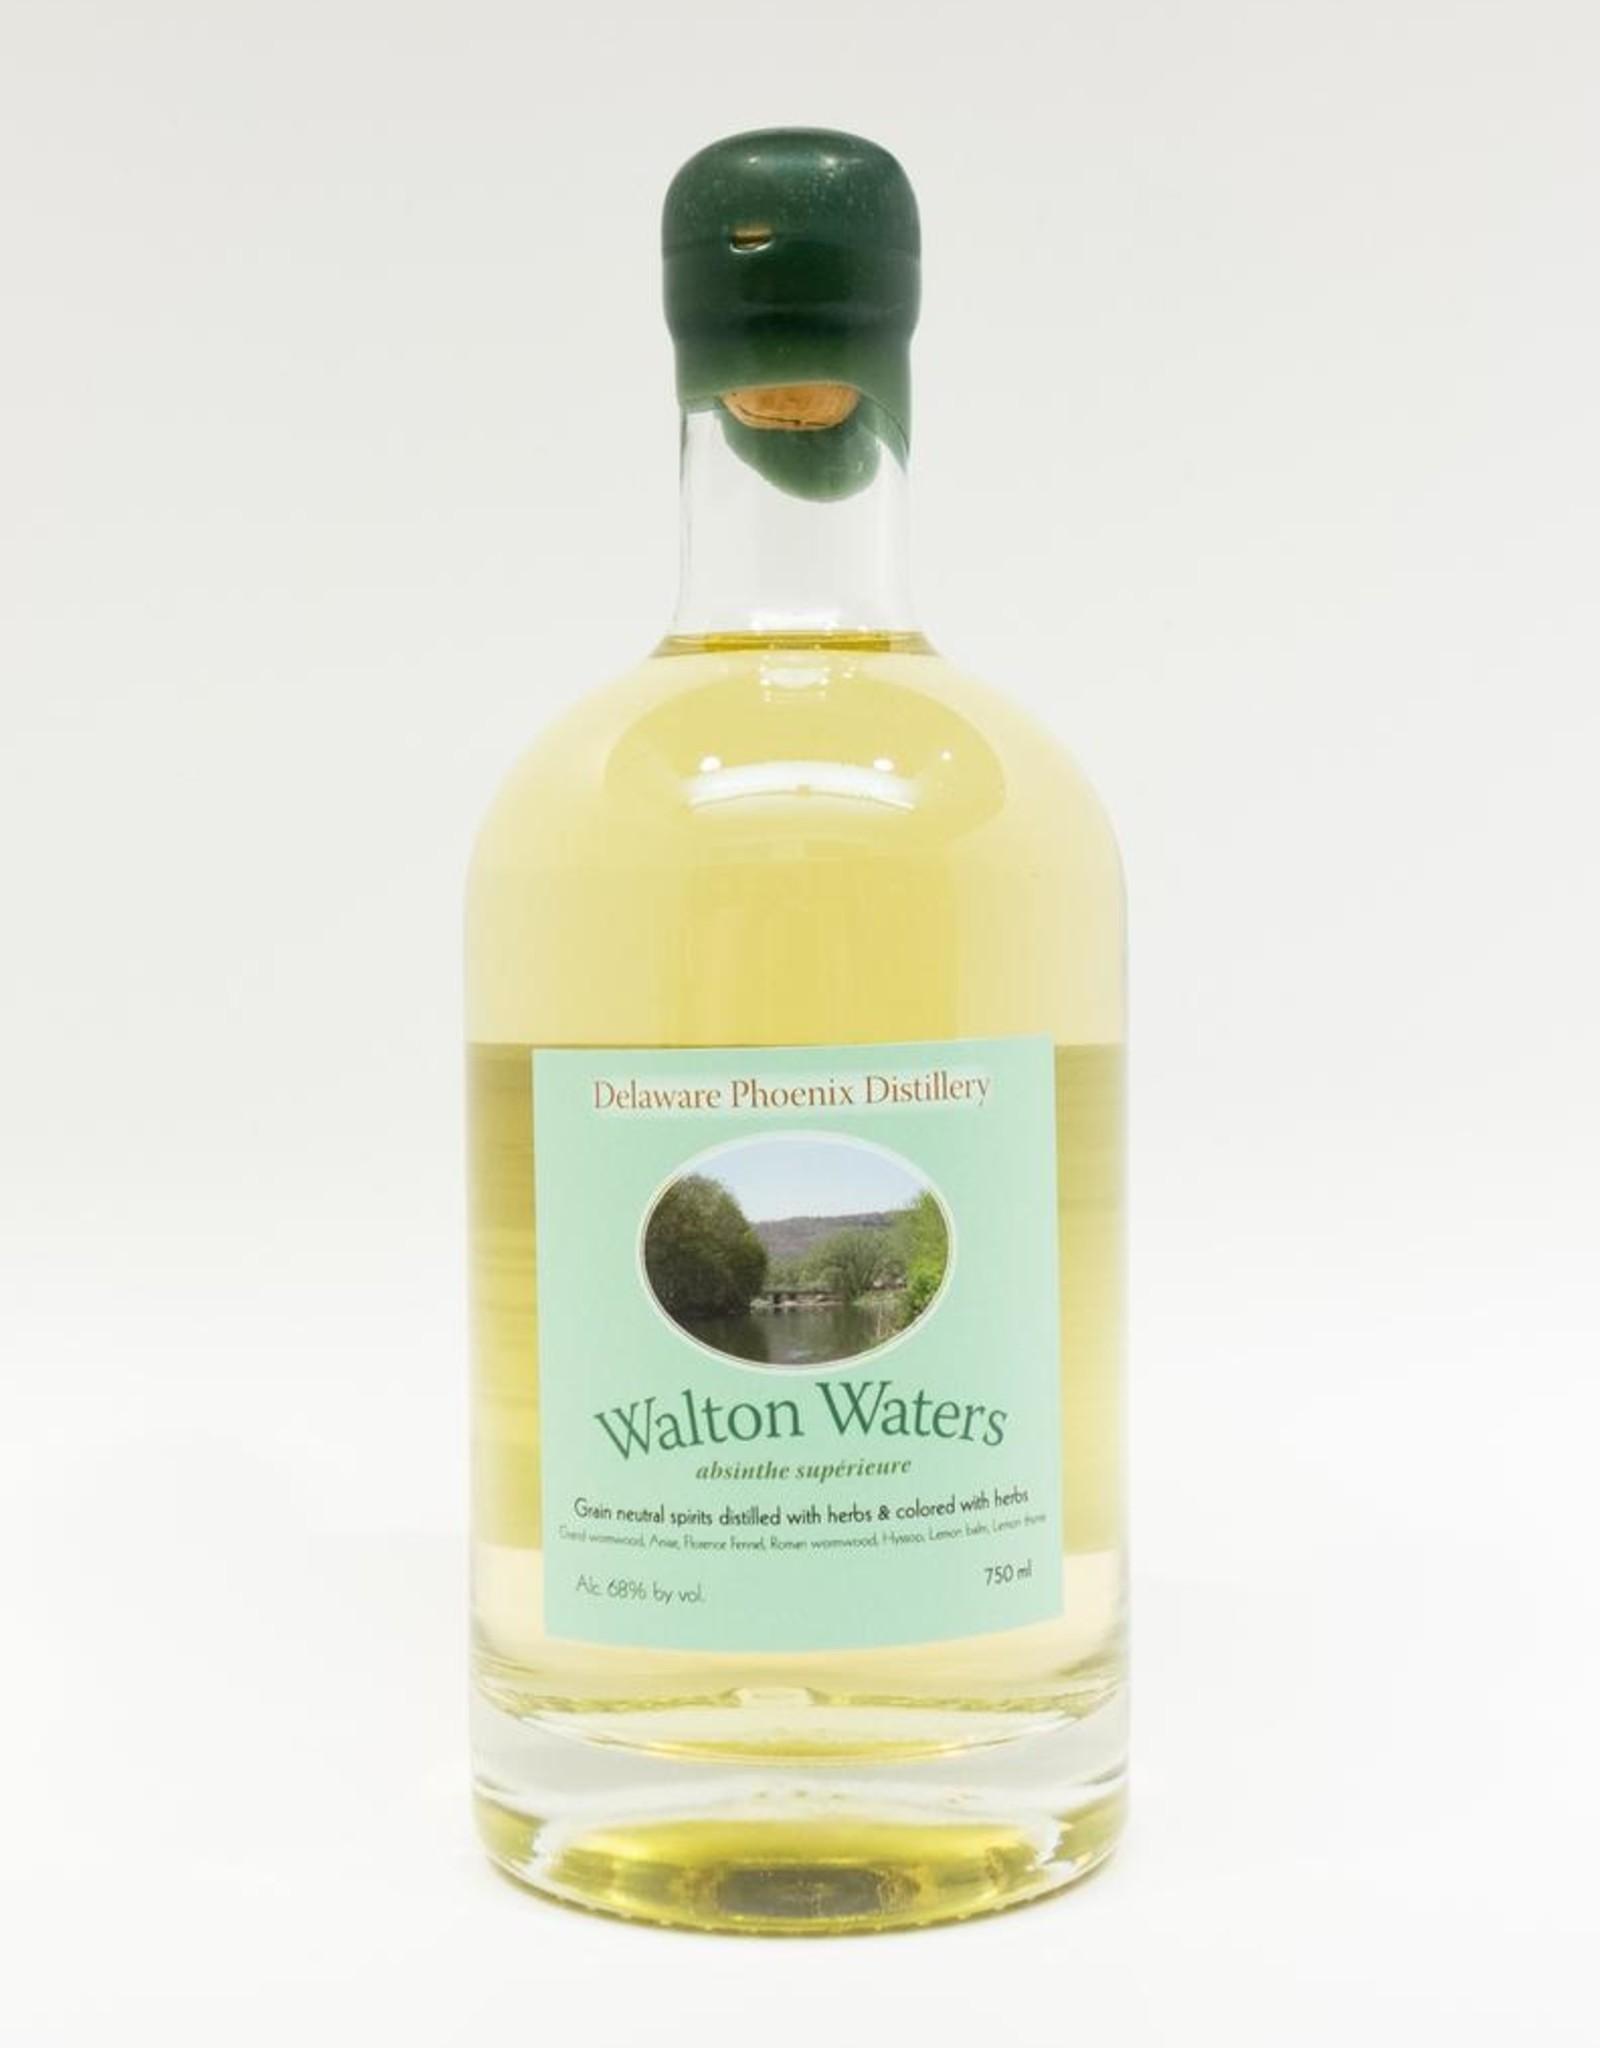 Spirits-Anise-Absinthe Delaware Phoenix Distillery Absinthe Superieure 'Walton Waters' 750ml